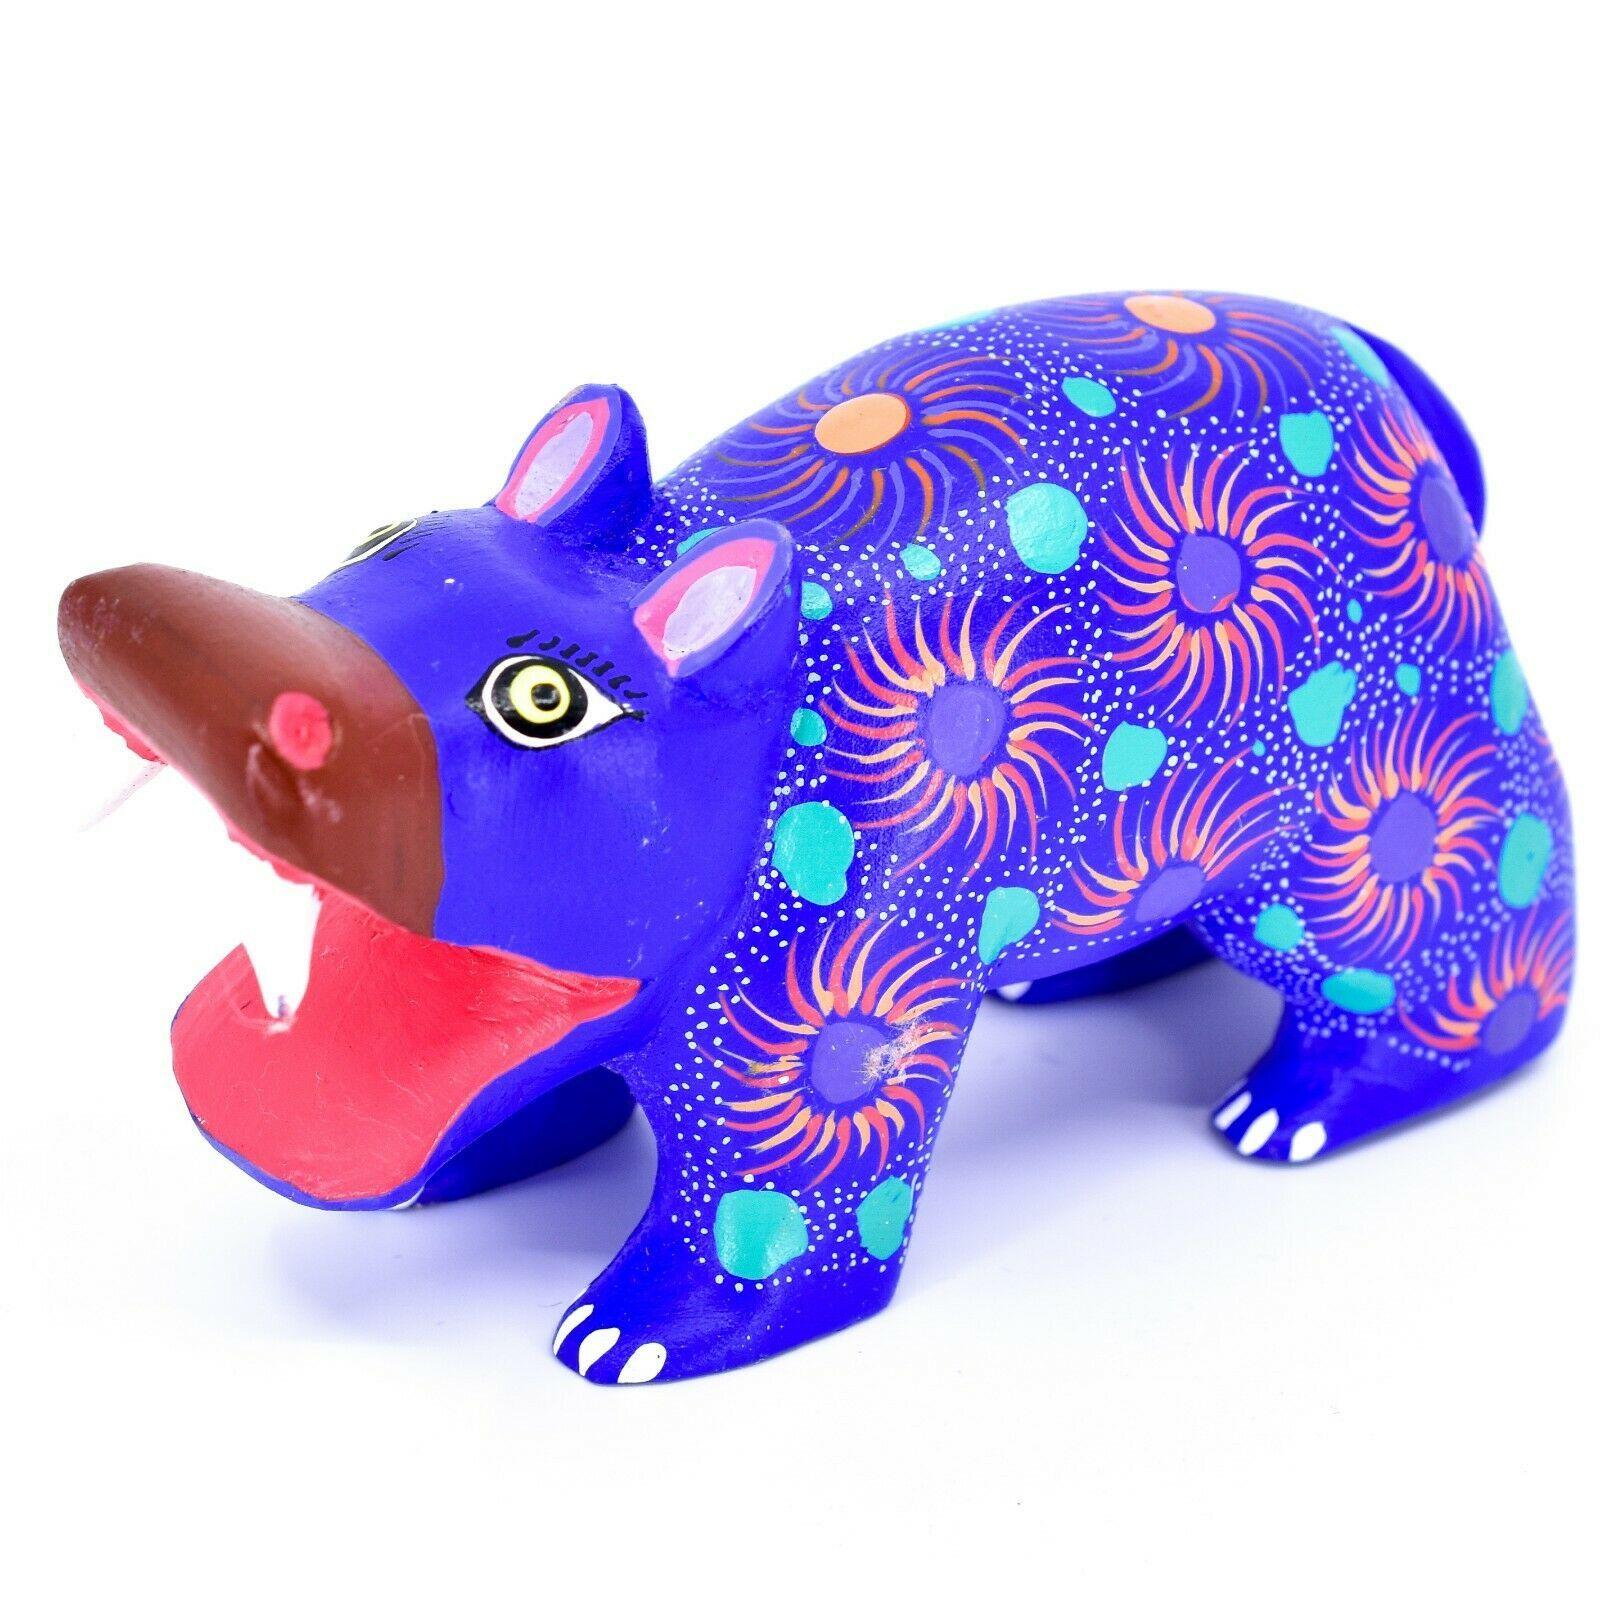 Handmade Oaxacan Copal Wood Carving Painted Folk Art Hippopotamus Hippo Figure